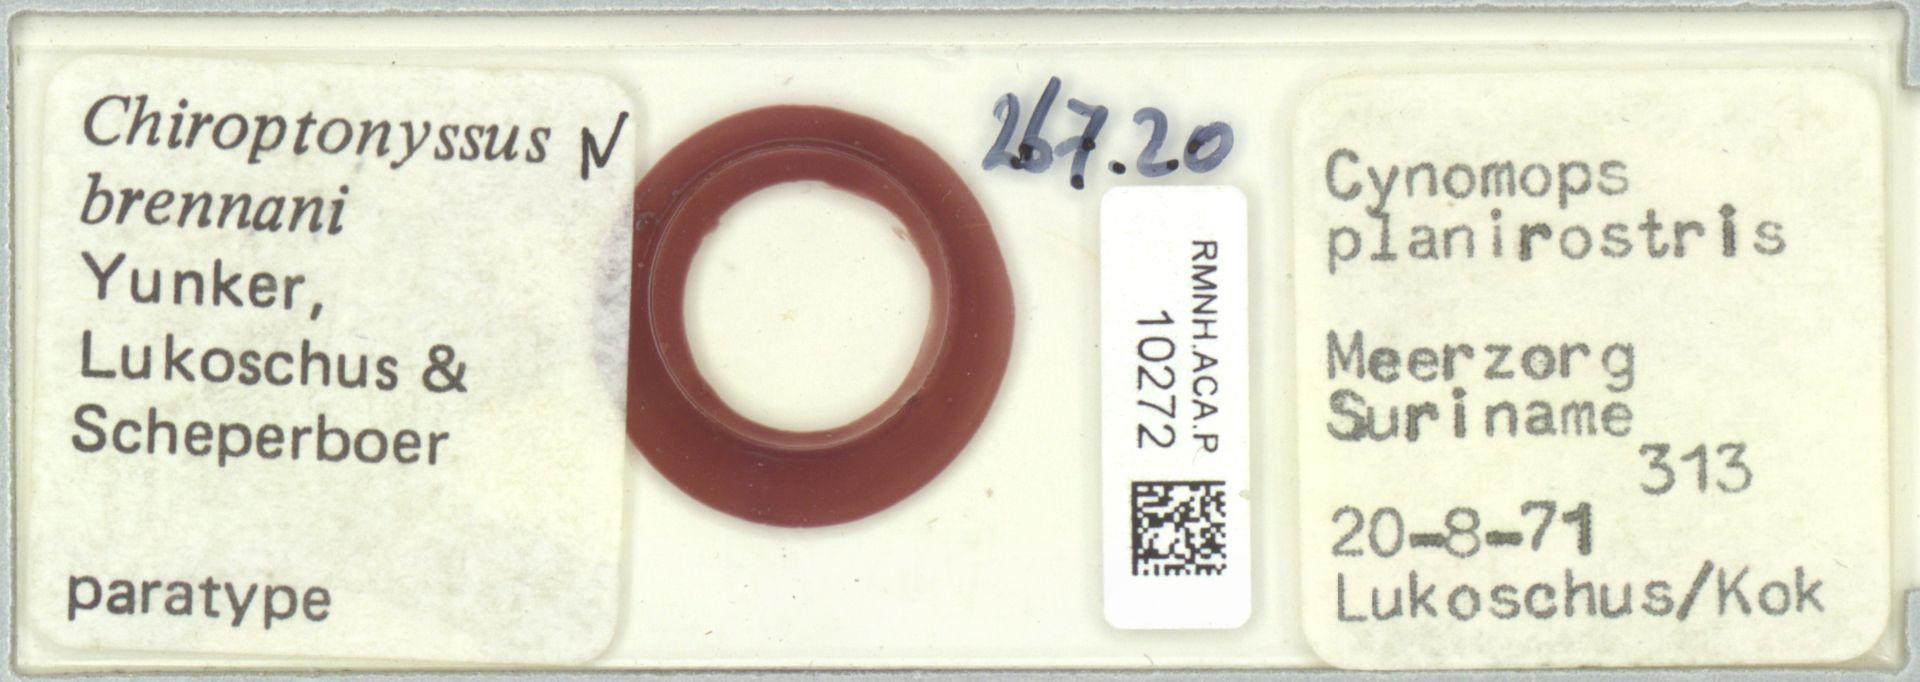 RMNH.ACA.P.10272 | Chiroptonyssus brennani Yunker, Lukoschus & Scheperboer